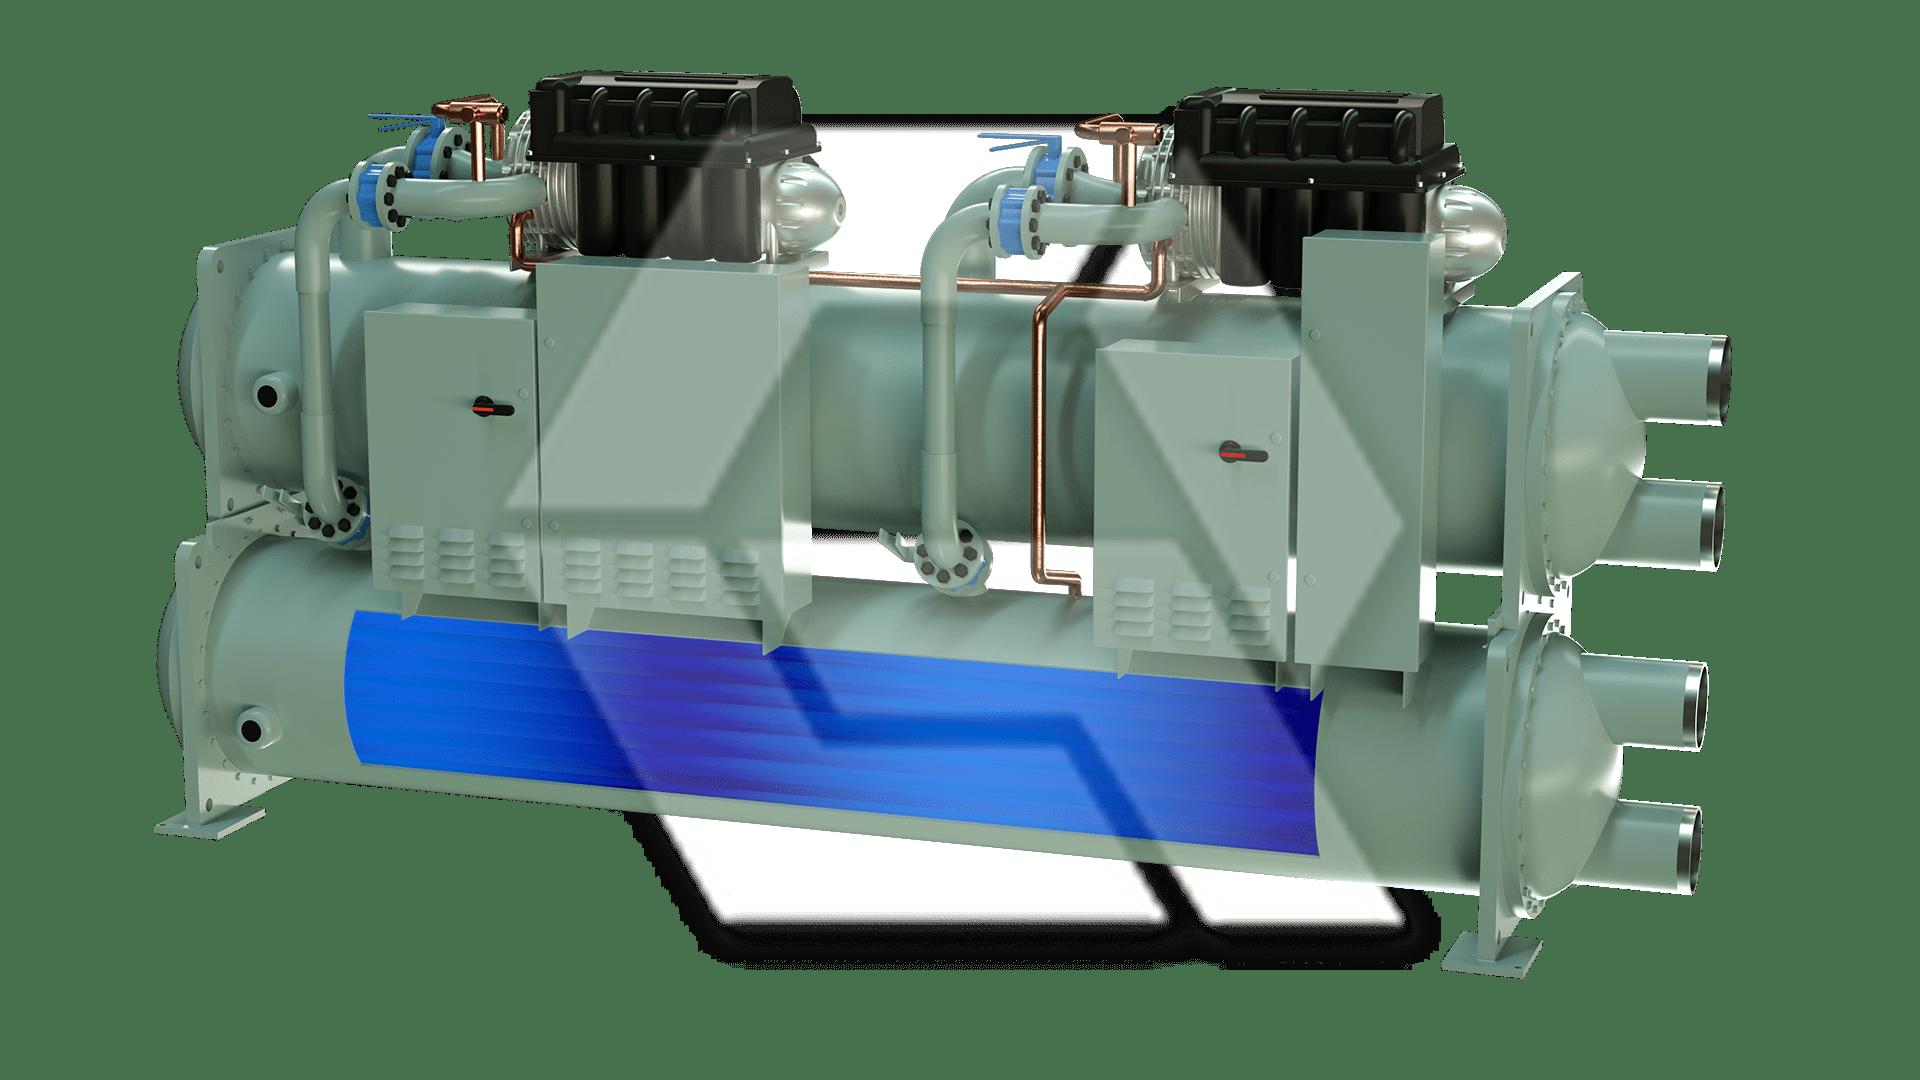 Dual Compressor Chiller 2 Open